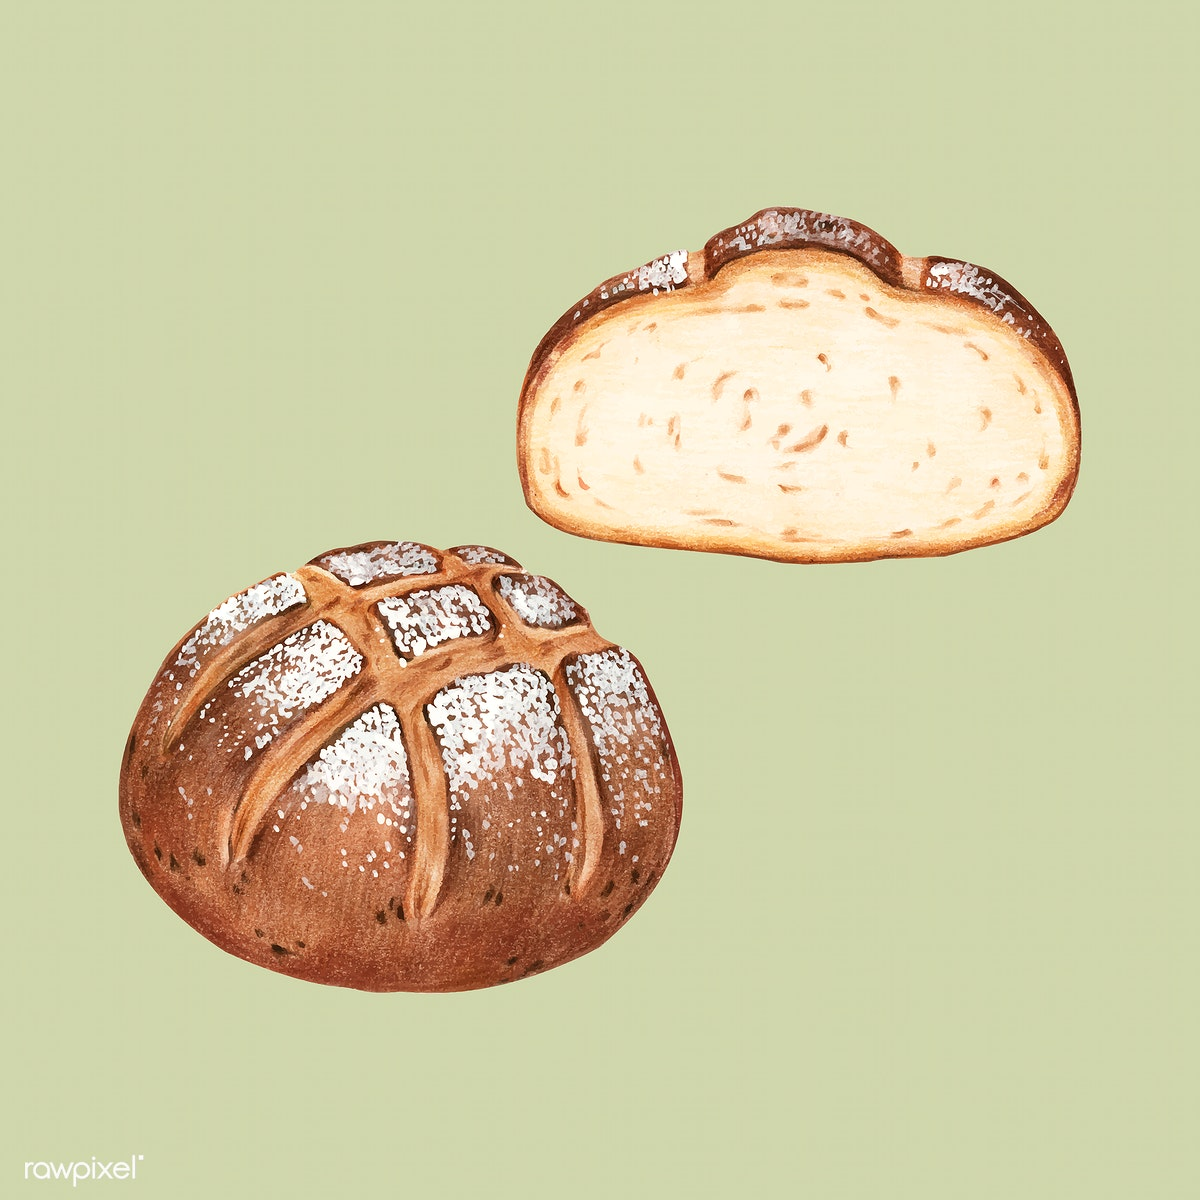 Bakery Artisan Bake